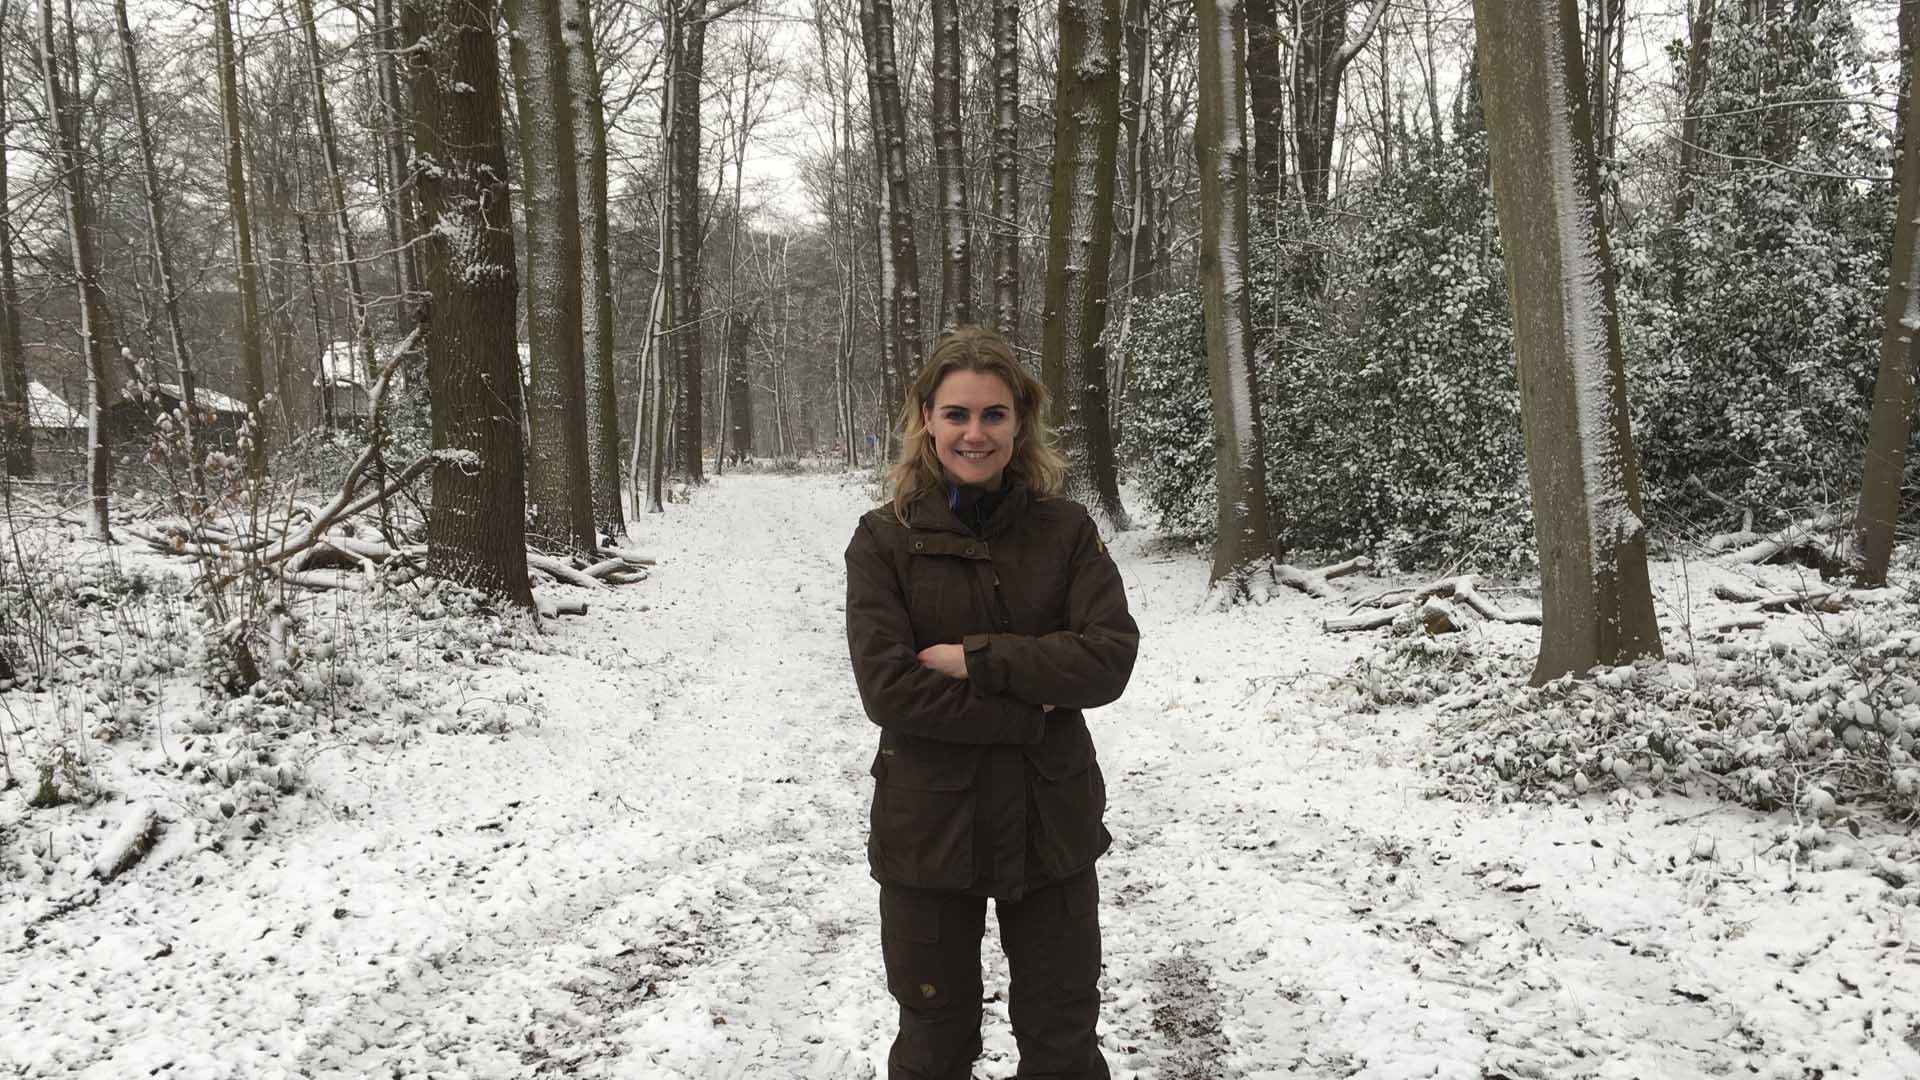 Hanne_landgoed Nijenburg